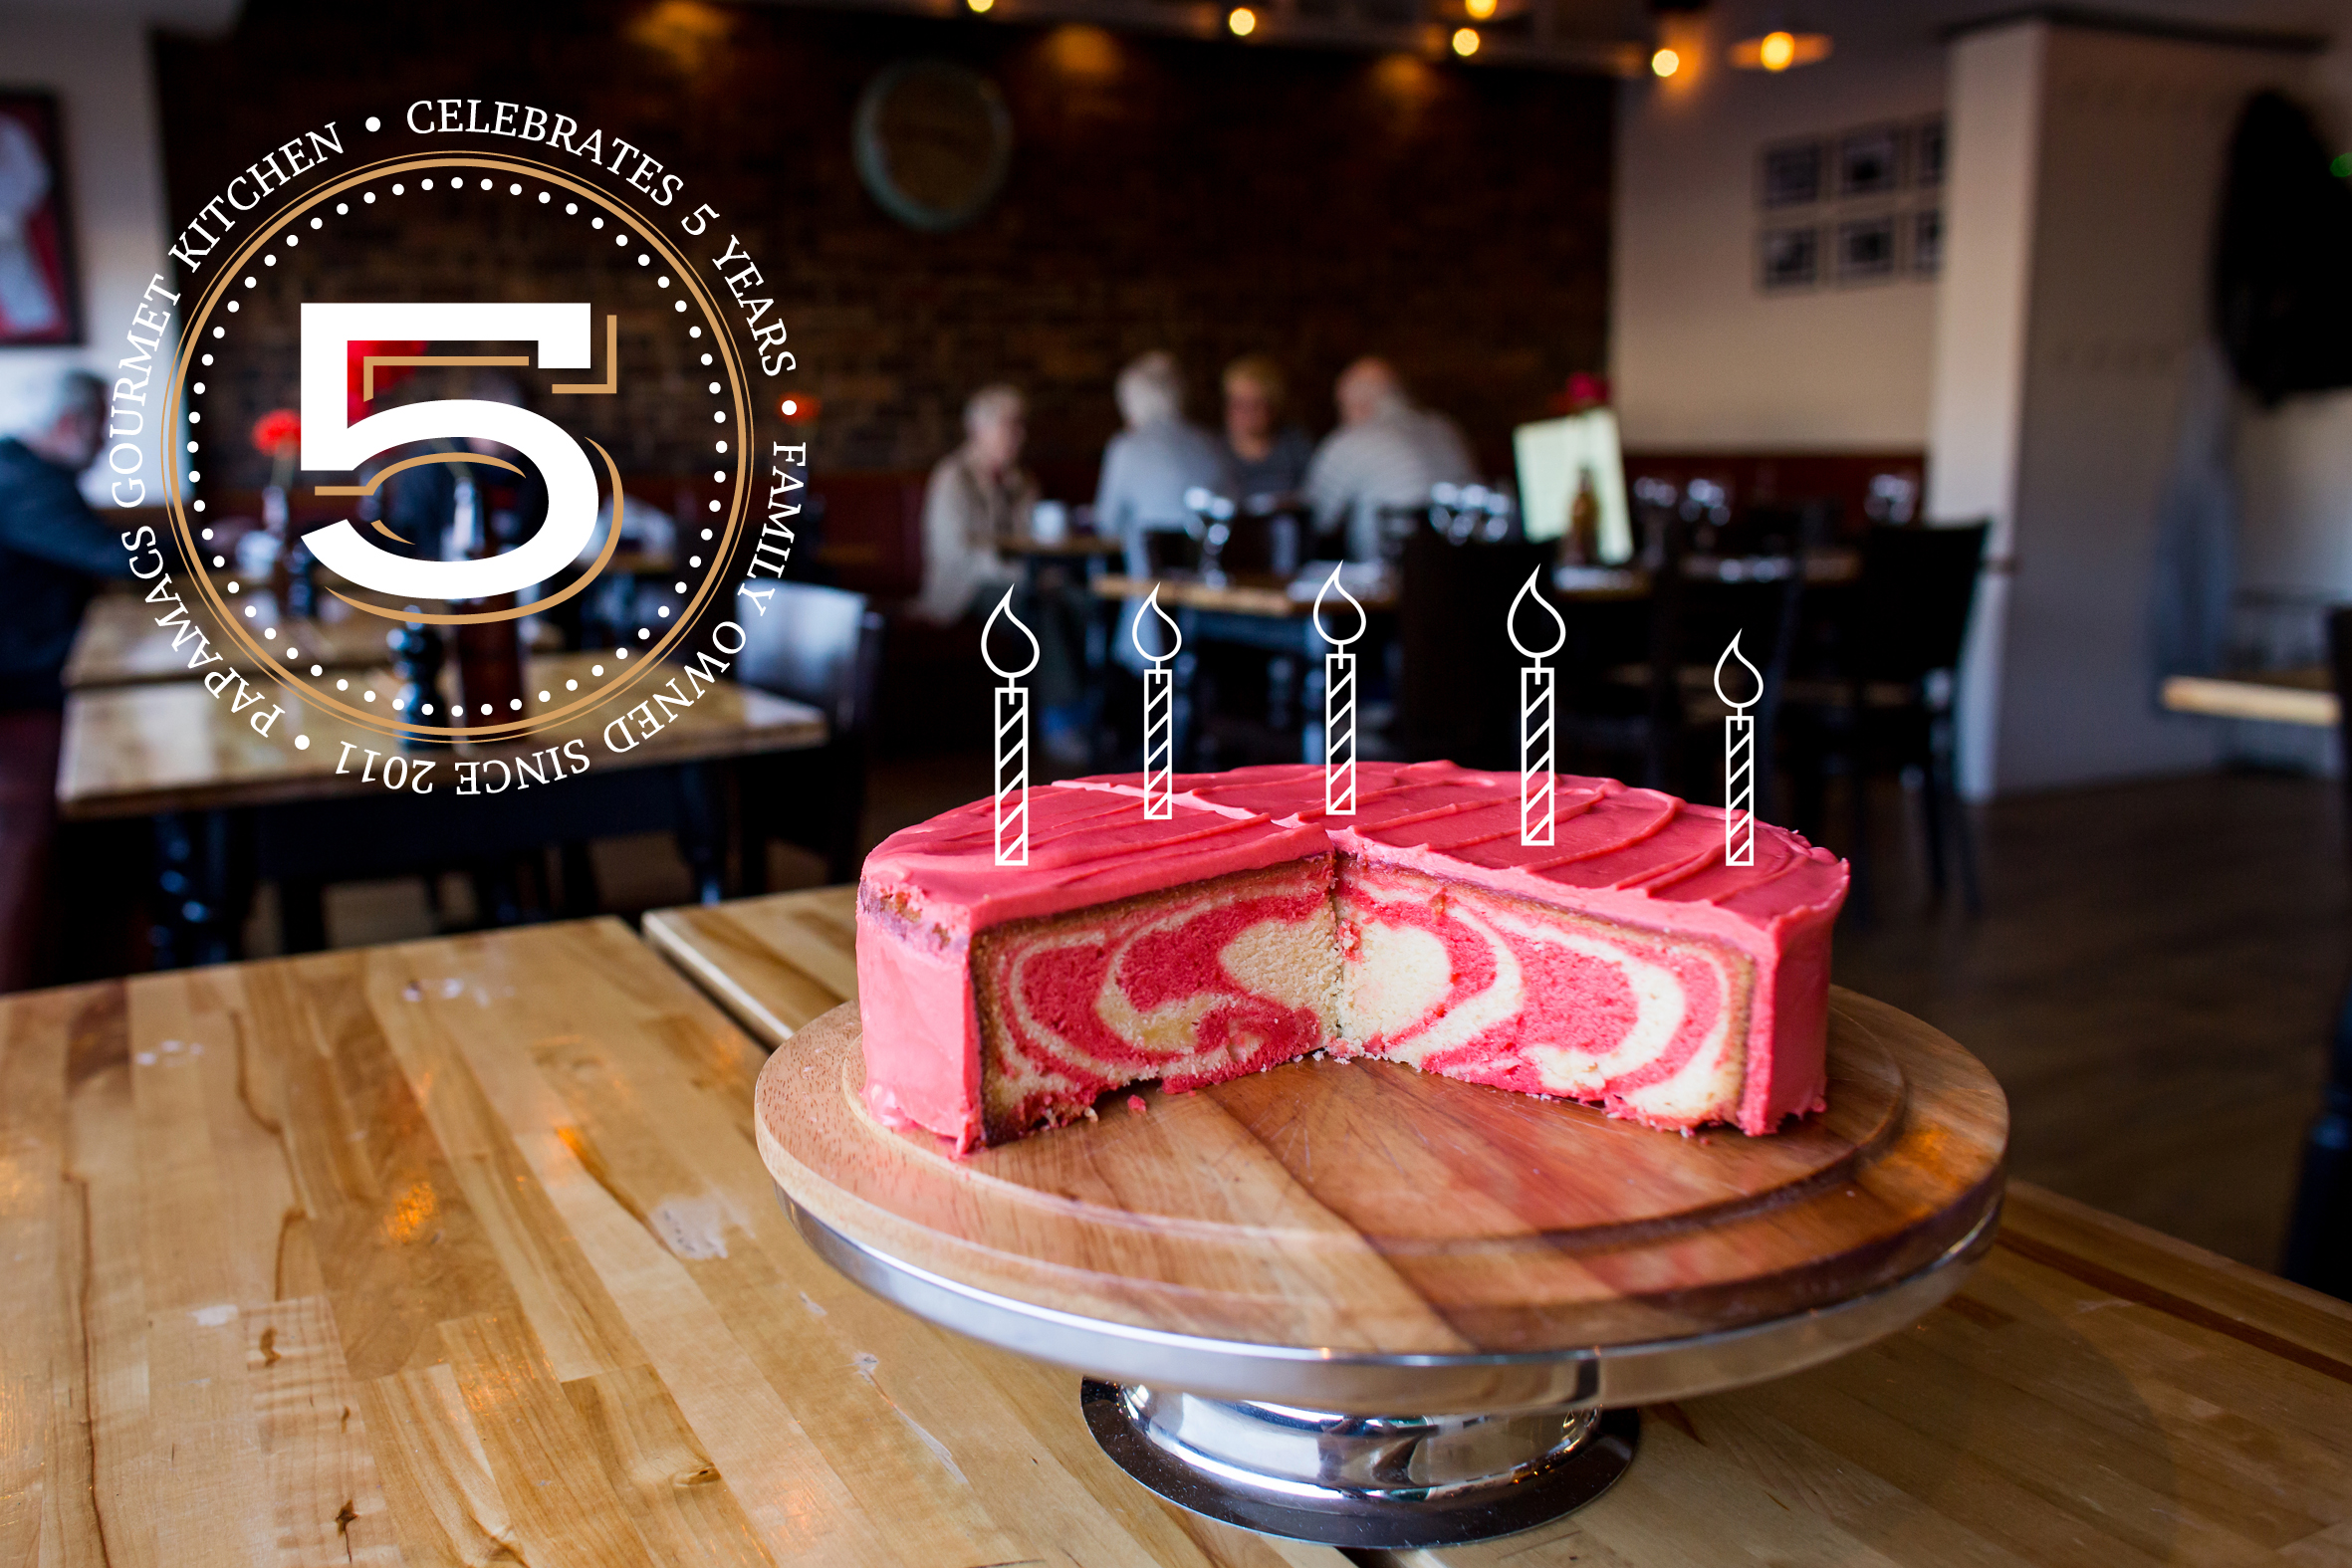 papamacs-gourmet-kitchen-restaurant-johnstone-renfrewshire-birthday-cake-1.jpg